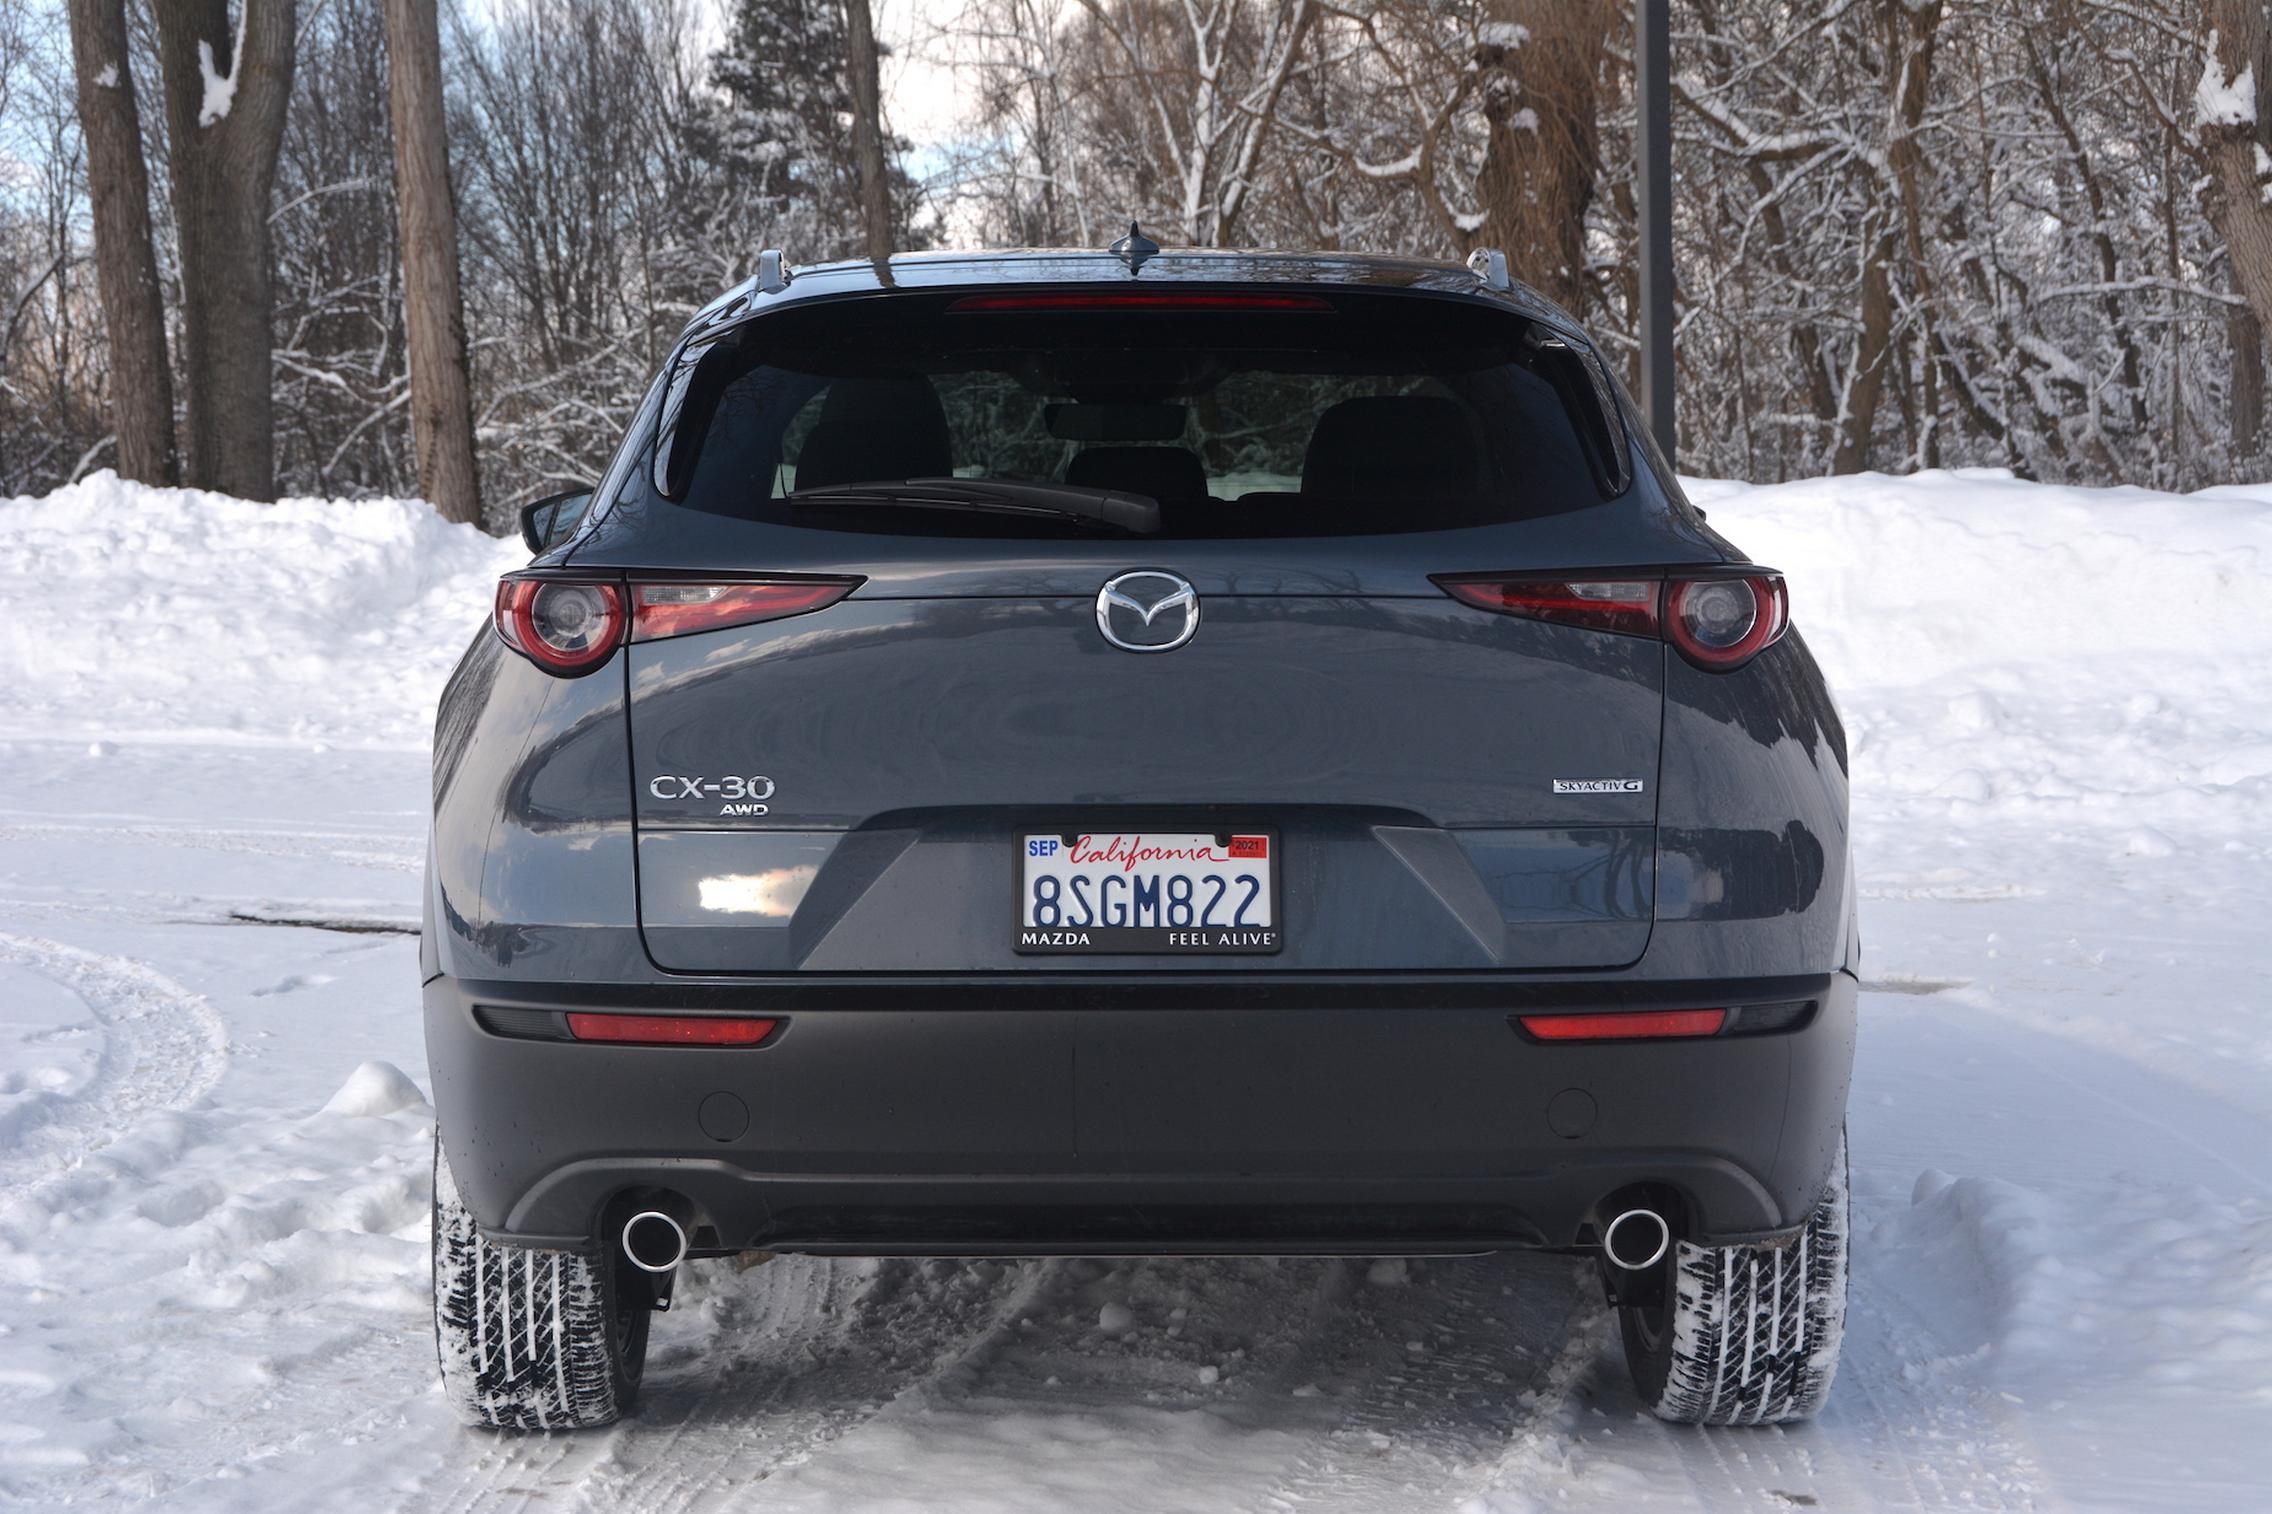 Mazda CX-30 AWD rear lights